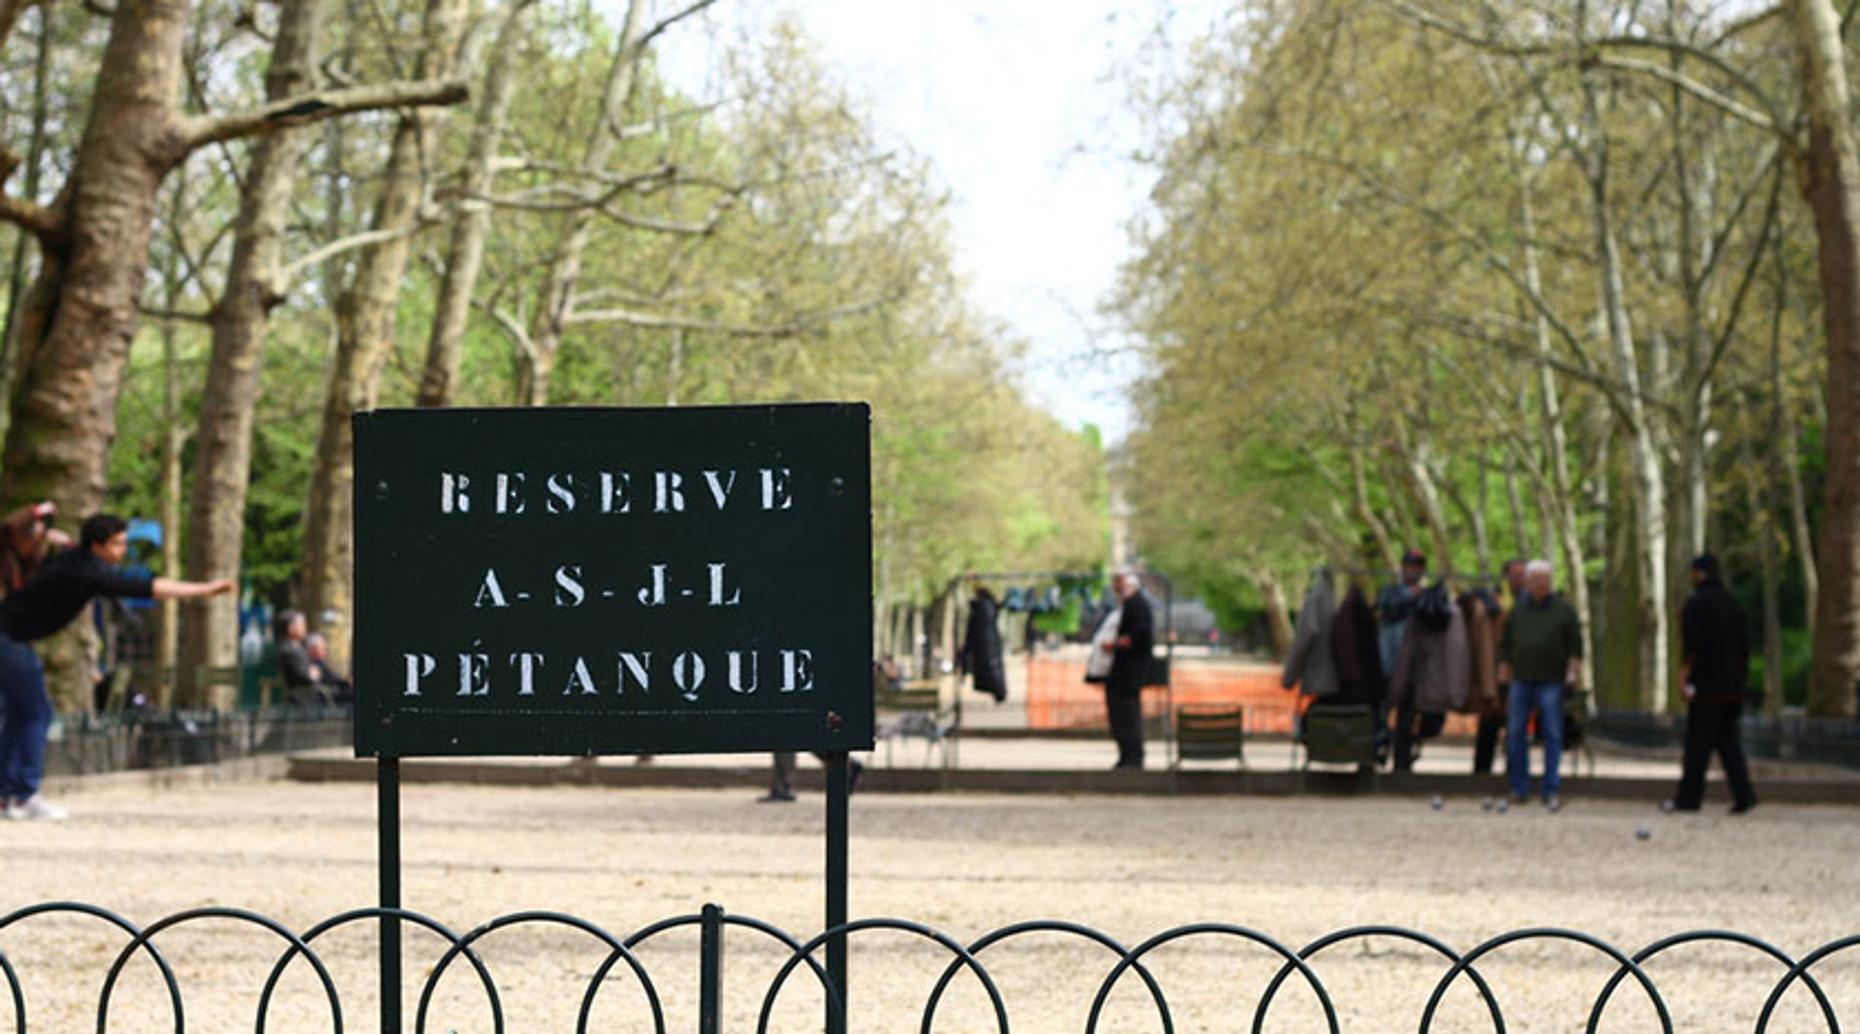 Pétanque in Paris